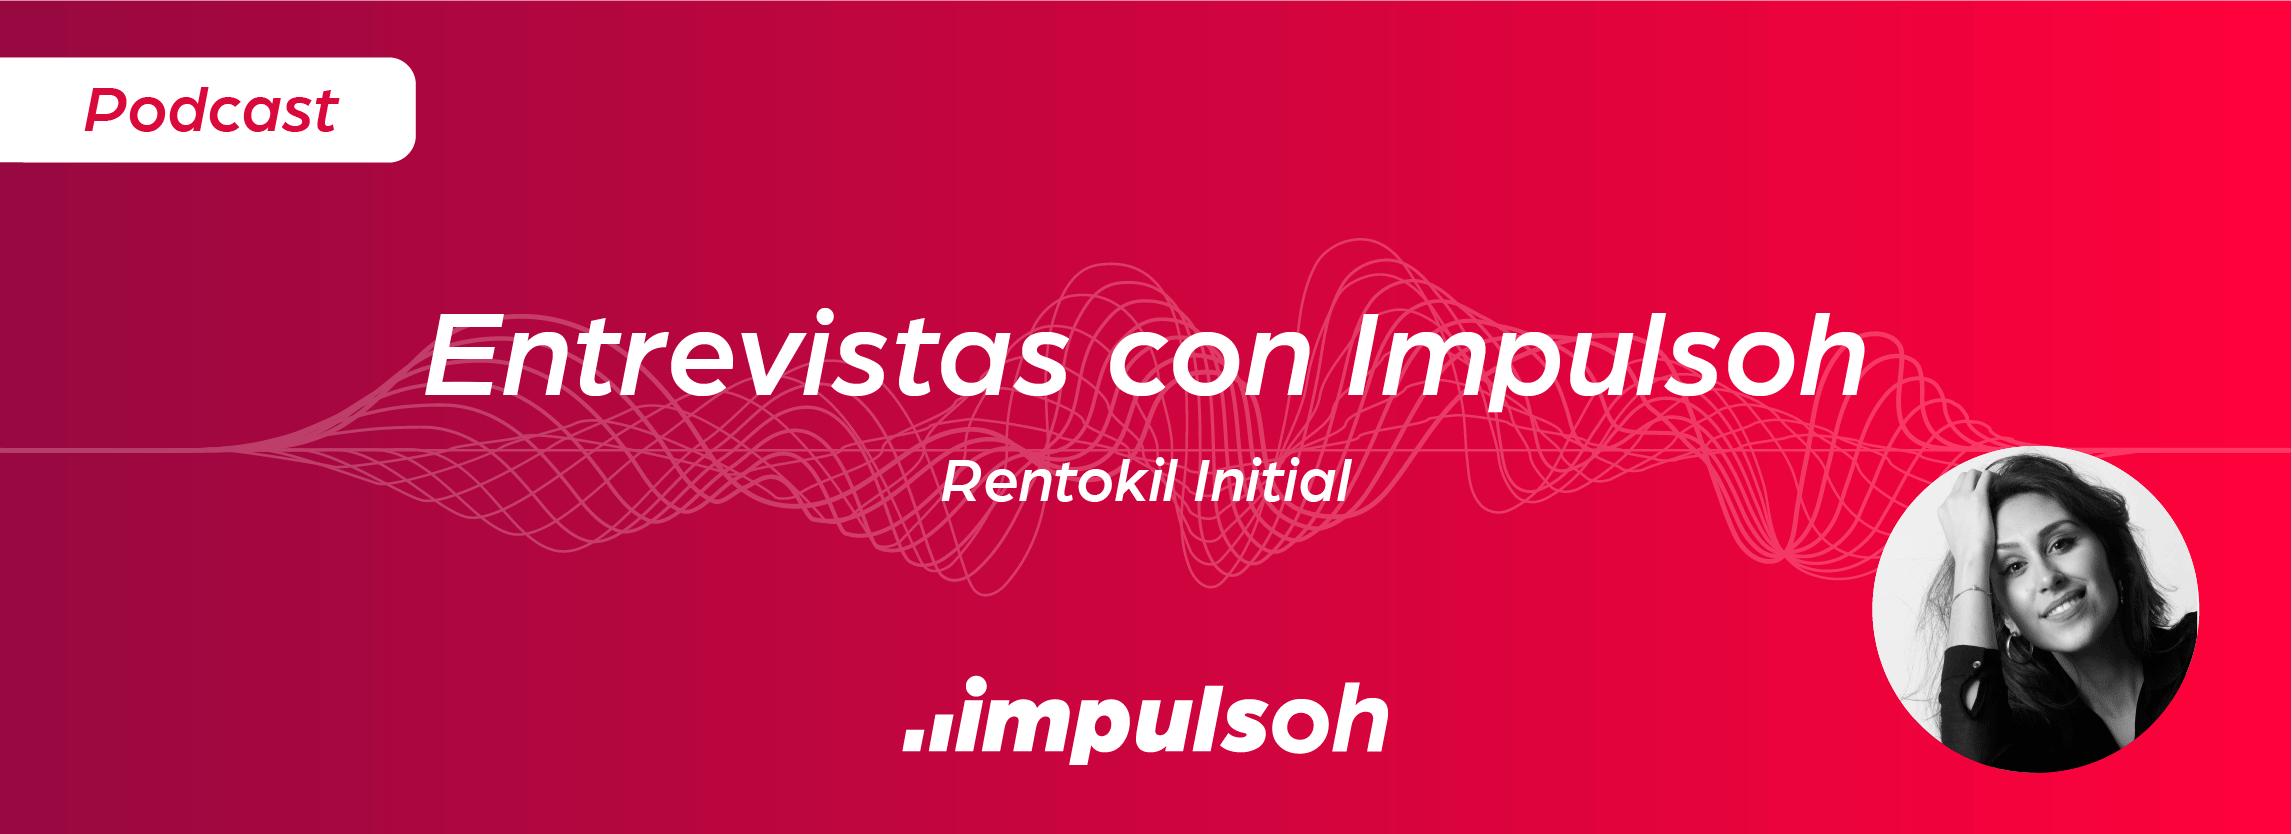 Entrevista_rentokil